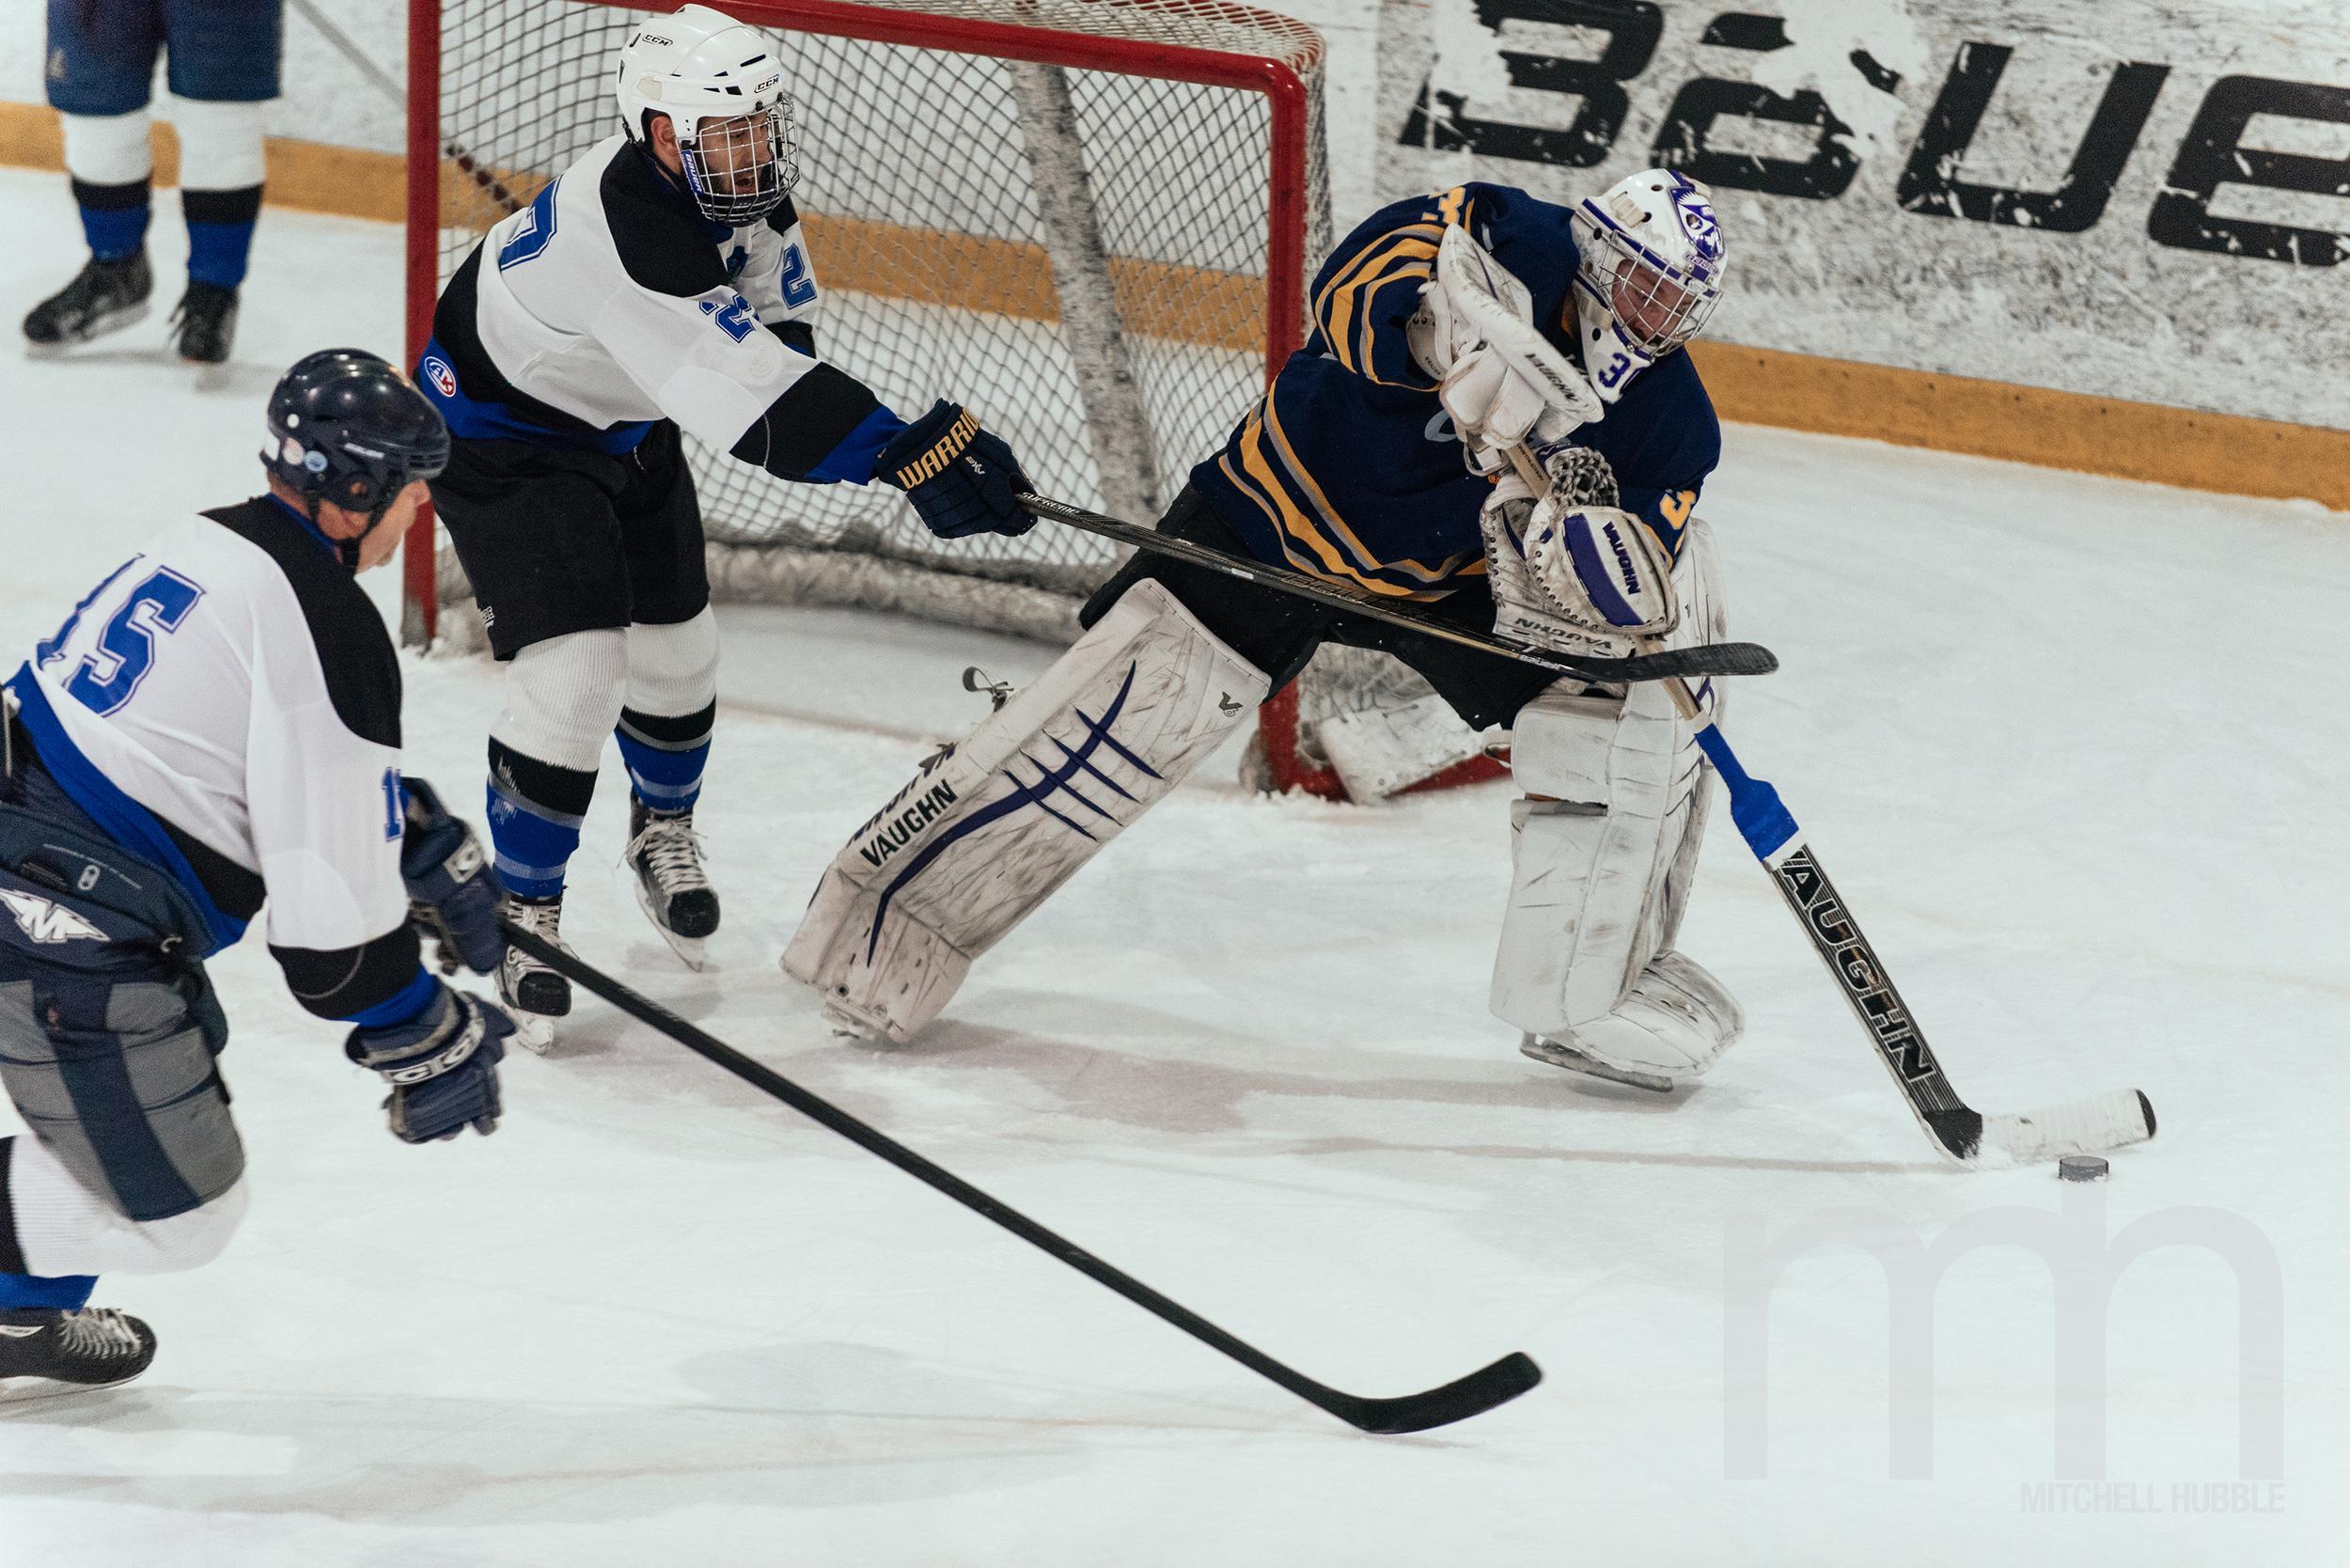 RB_Hockey-50.jpg